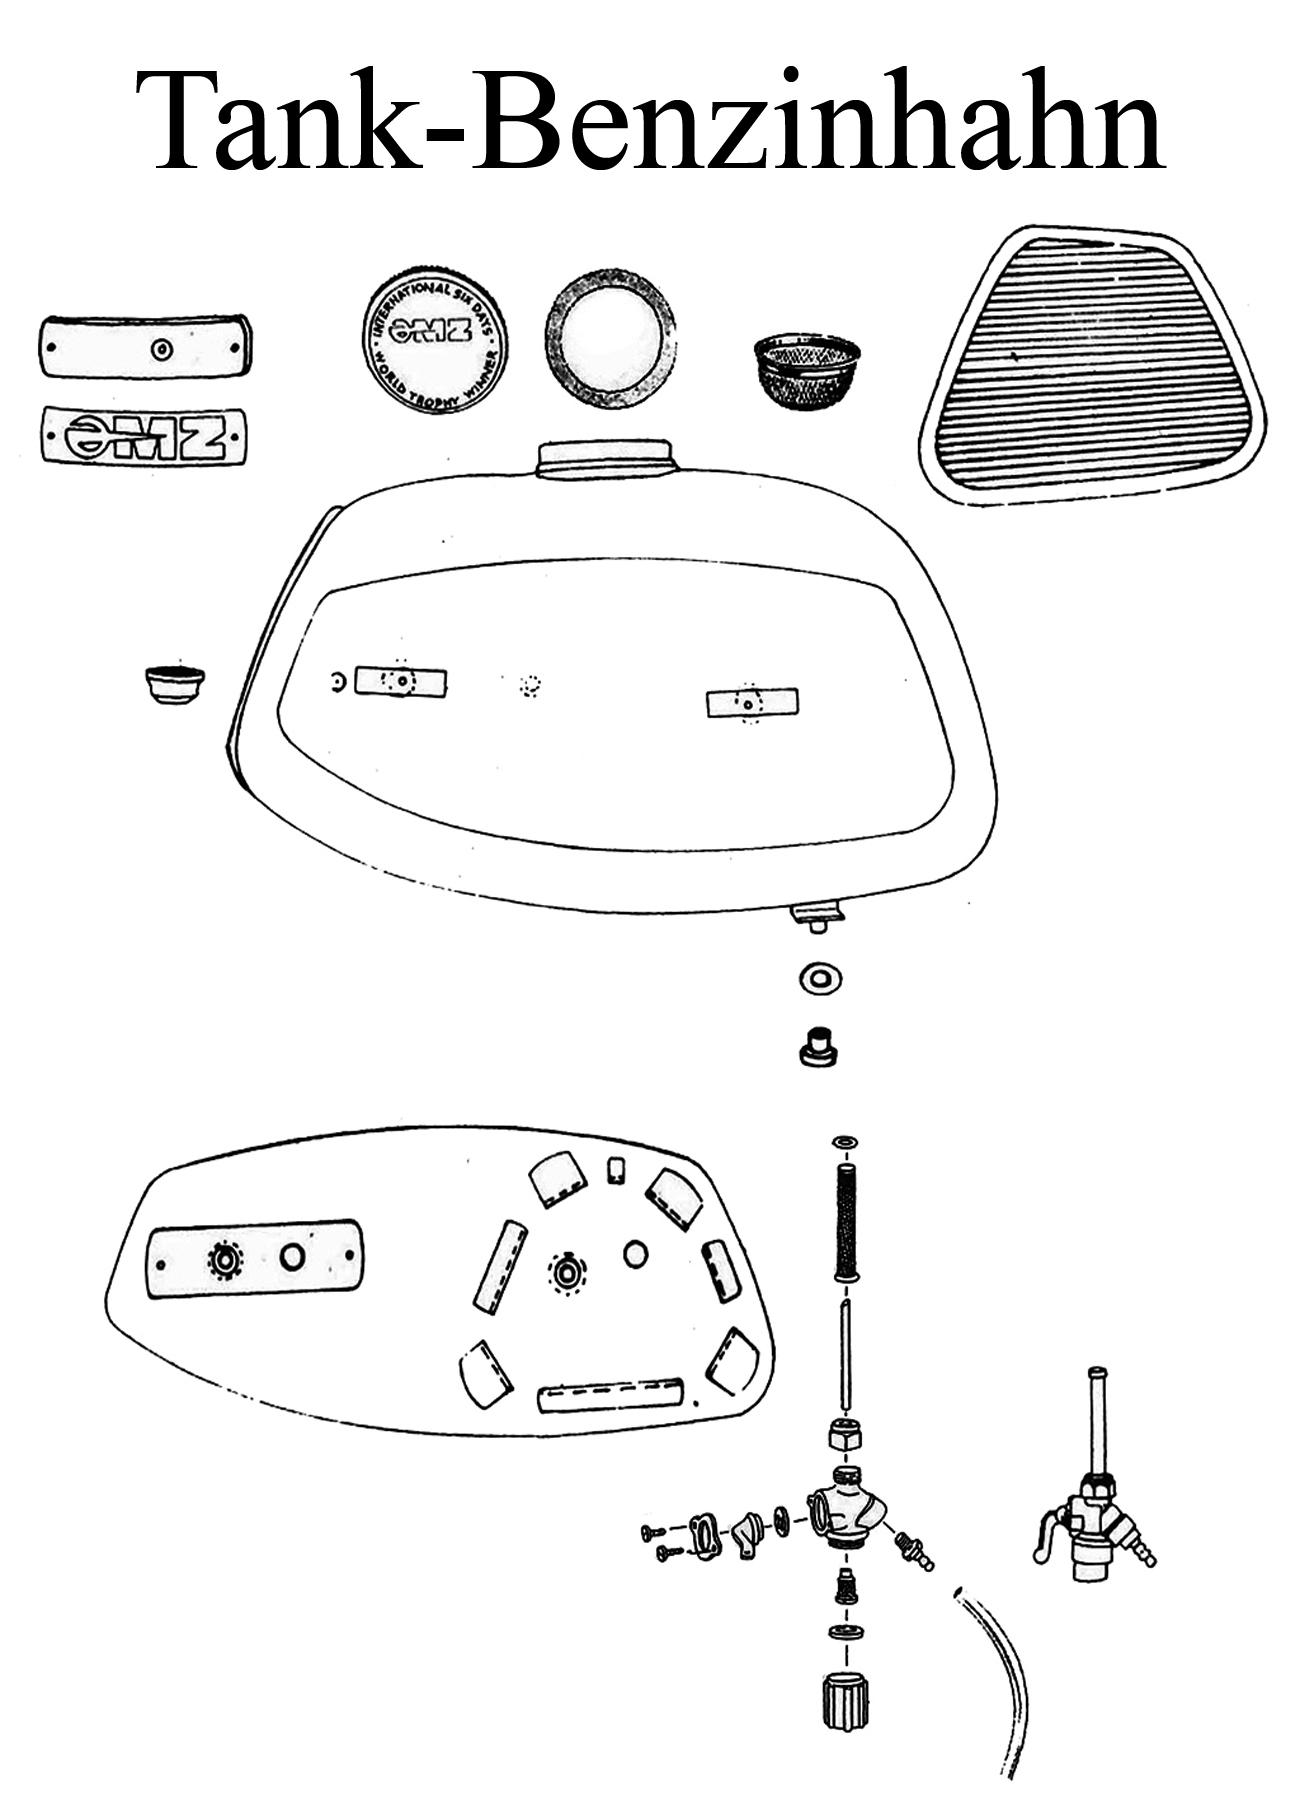 DDR-Motorrad MZ TS 125-150 Ersatzteile Tank Benzinhahn